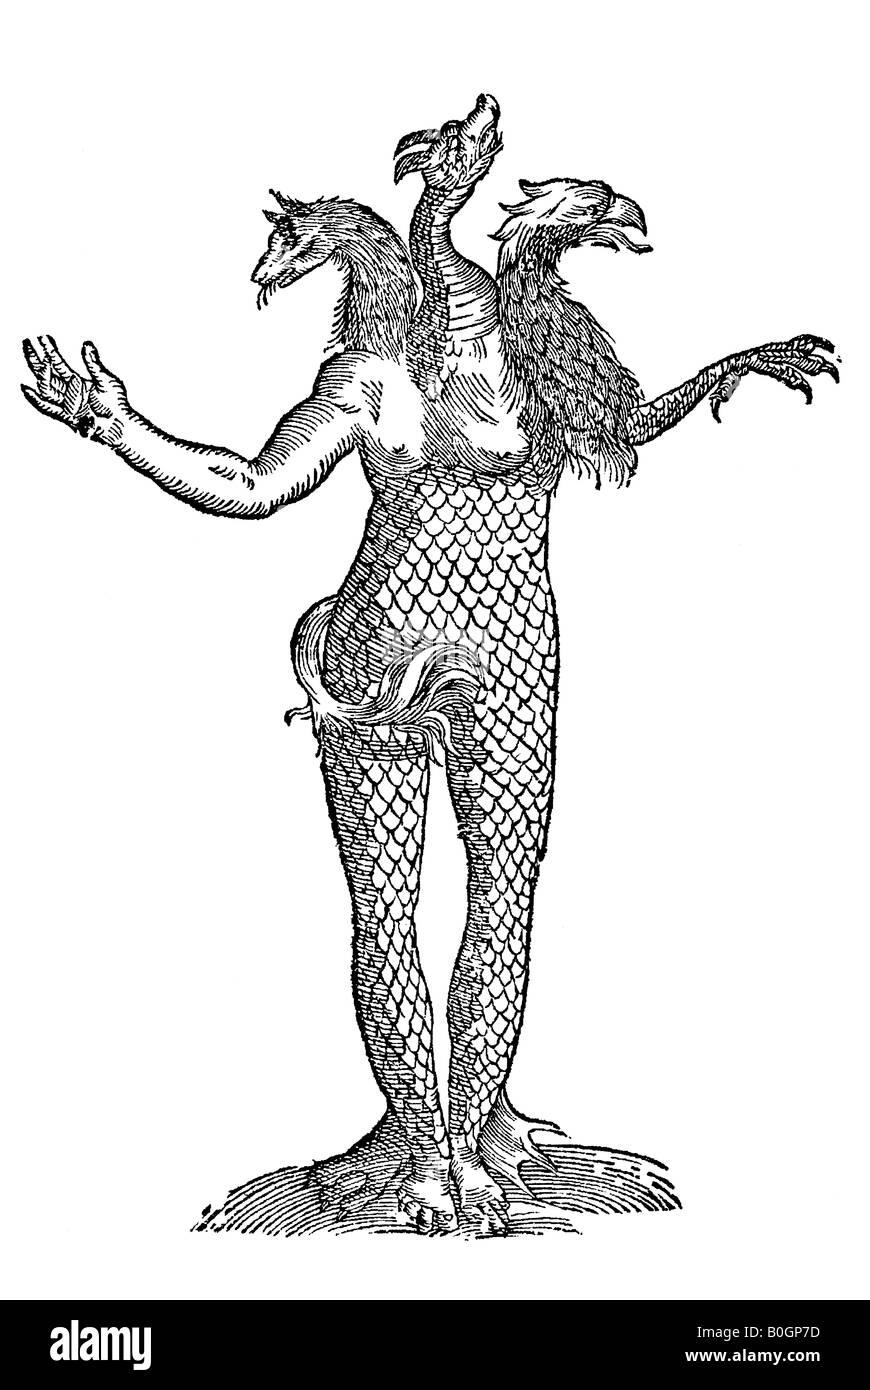 Monstrum Trizeps Capite Vulpis Draconis & Aquilae, Aldrovandi, 1642, 17. Jahrhundert, Renaissance, Europa Stockbild